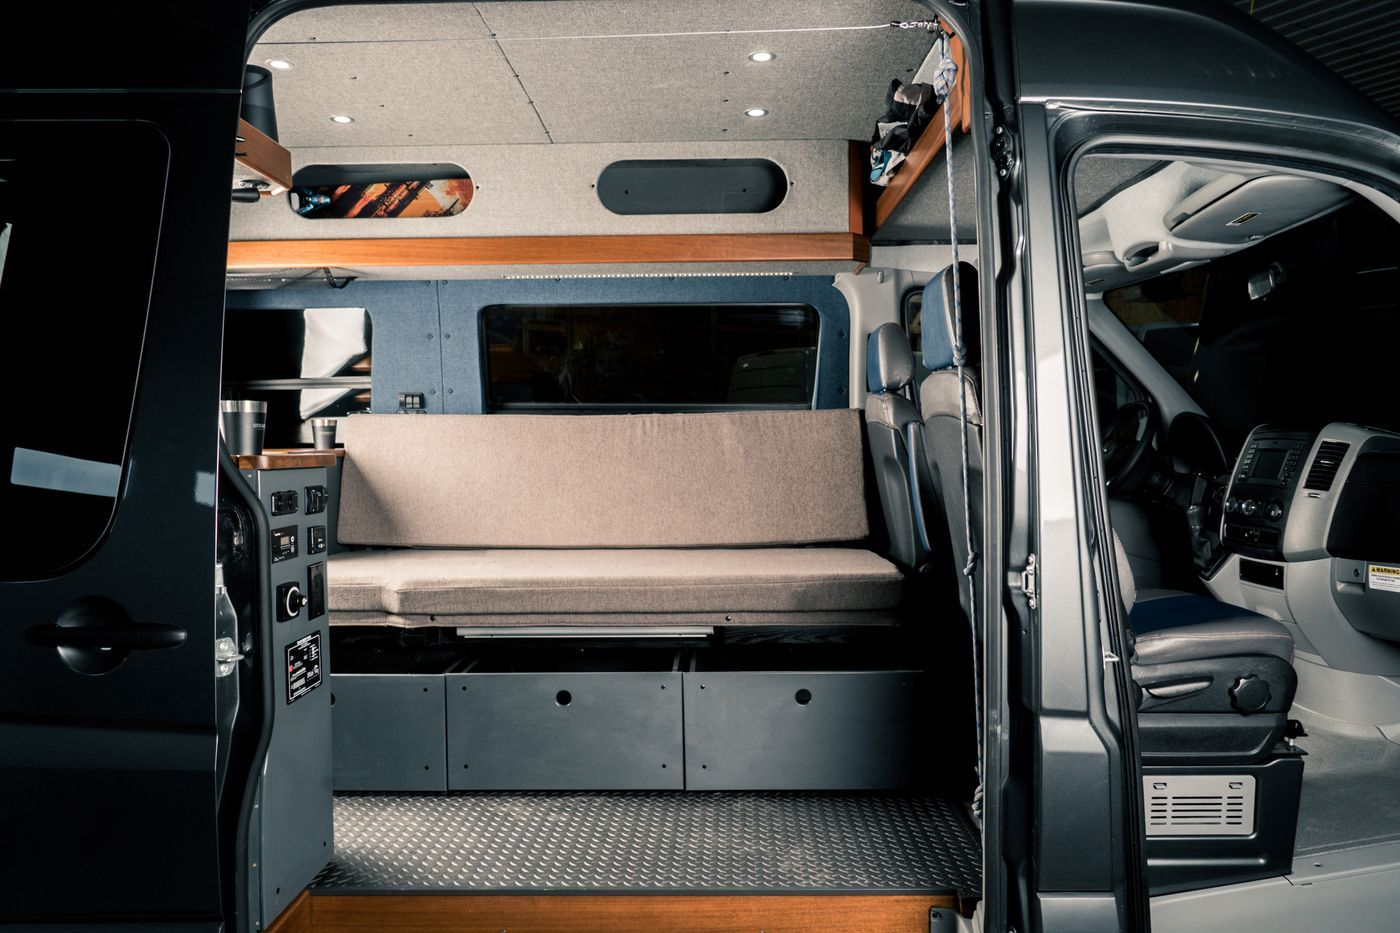 0d36a0f5e8cb 7 van conversion companies that can build your dream camper - Curbed ...